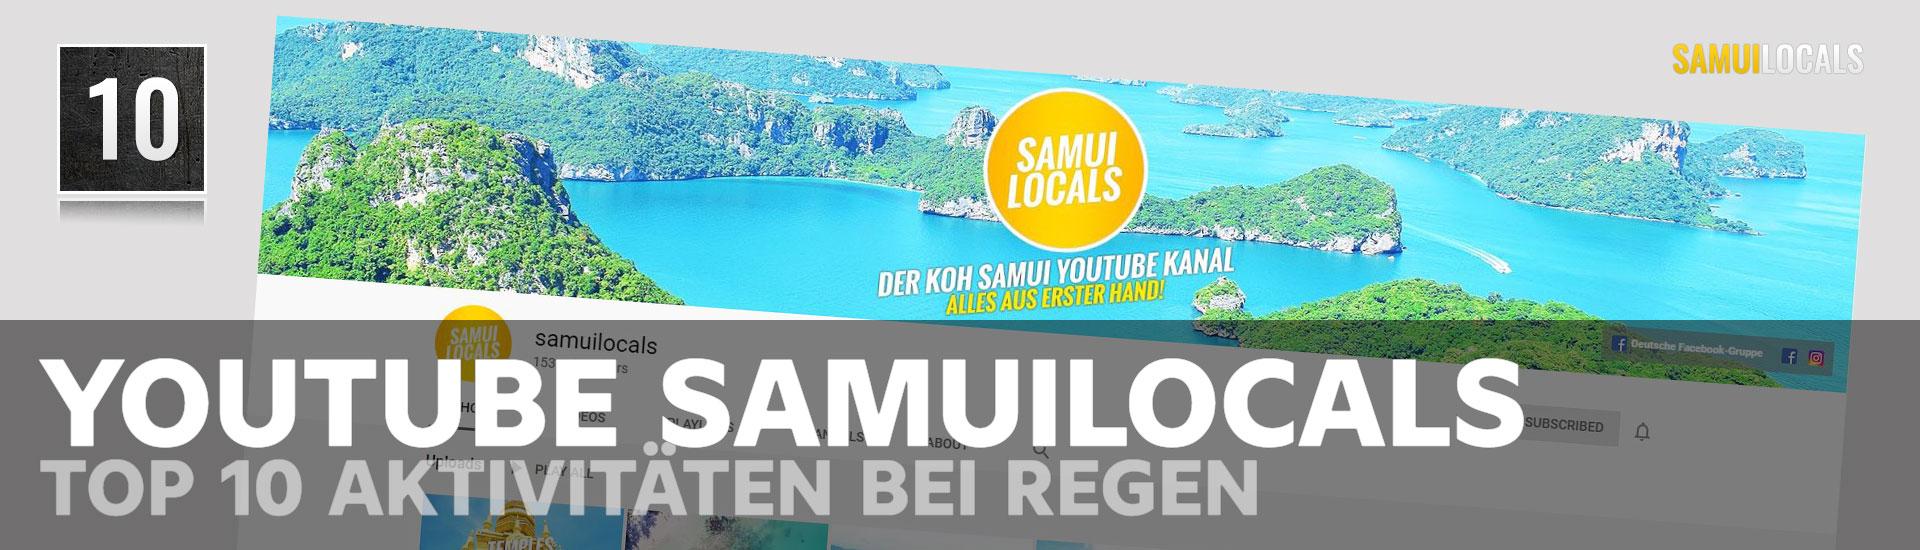 top_10_aktivitaeten_bei_regen_youtube_kanal_samuilocals